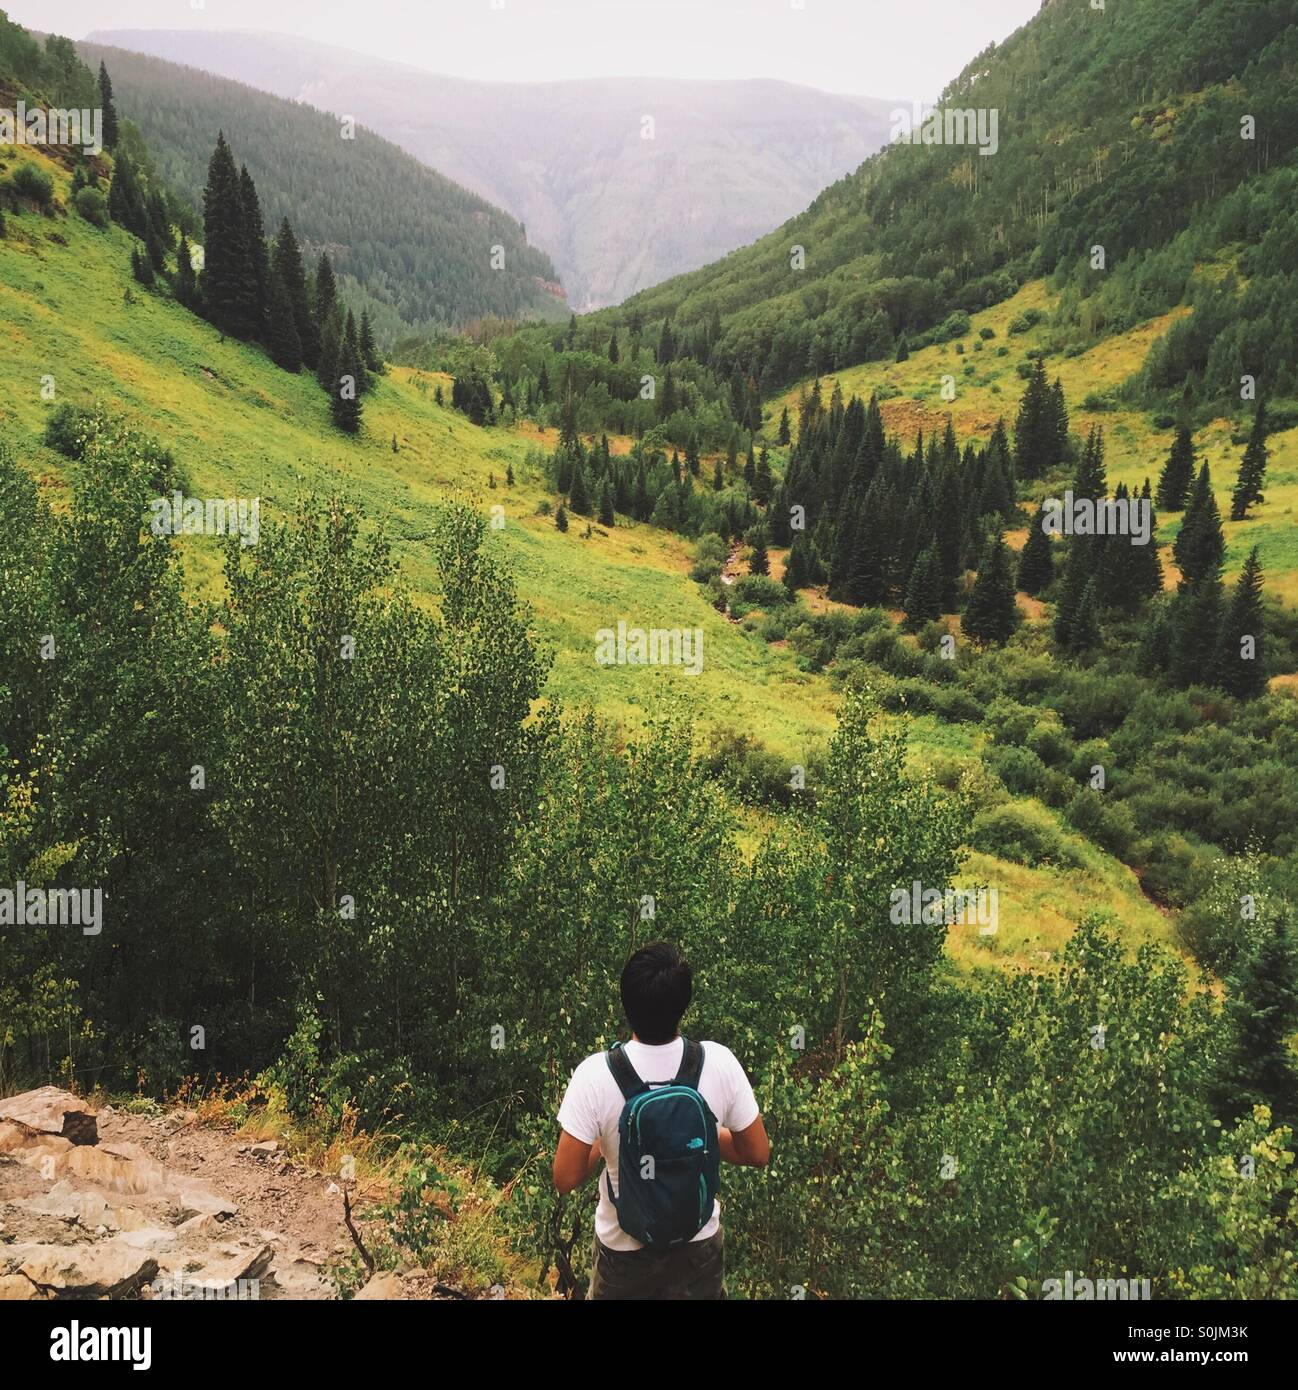 Mountain hike - Stock Image